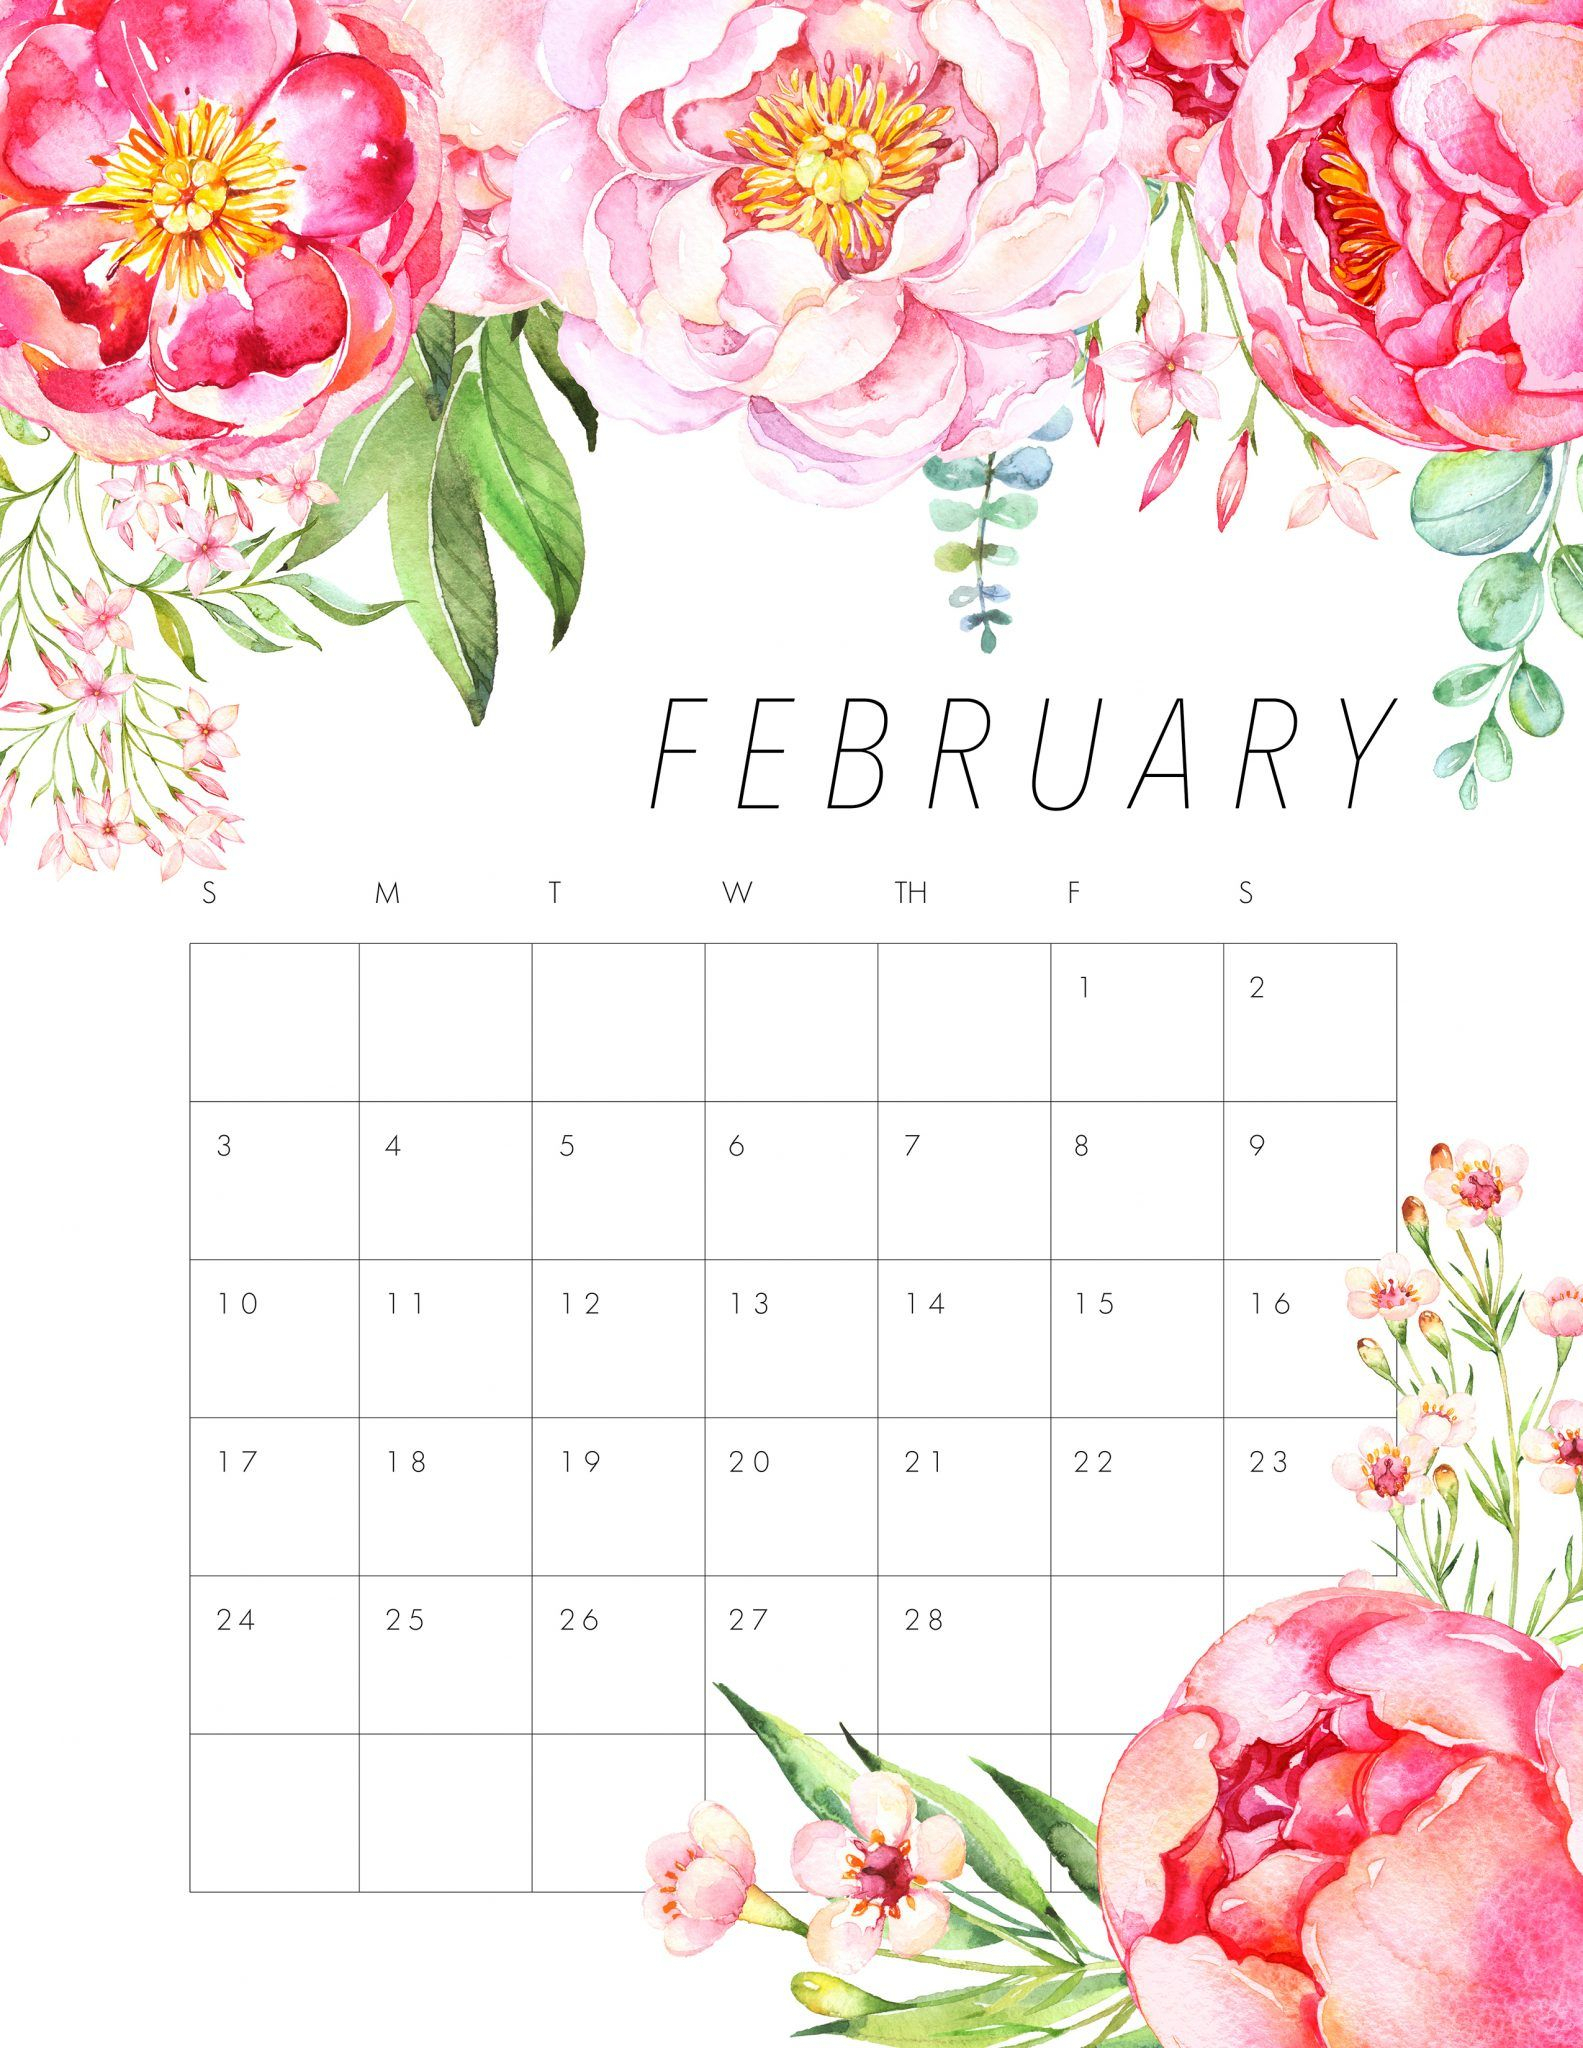 Floral February 2020 Wall Calendar Wallpaper For Desktop with How To Make Google Calendar My Desktop Background